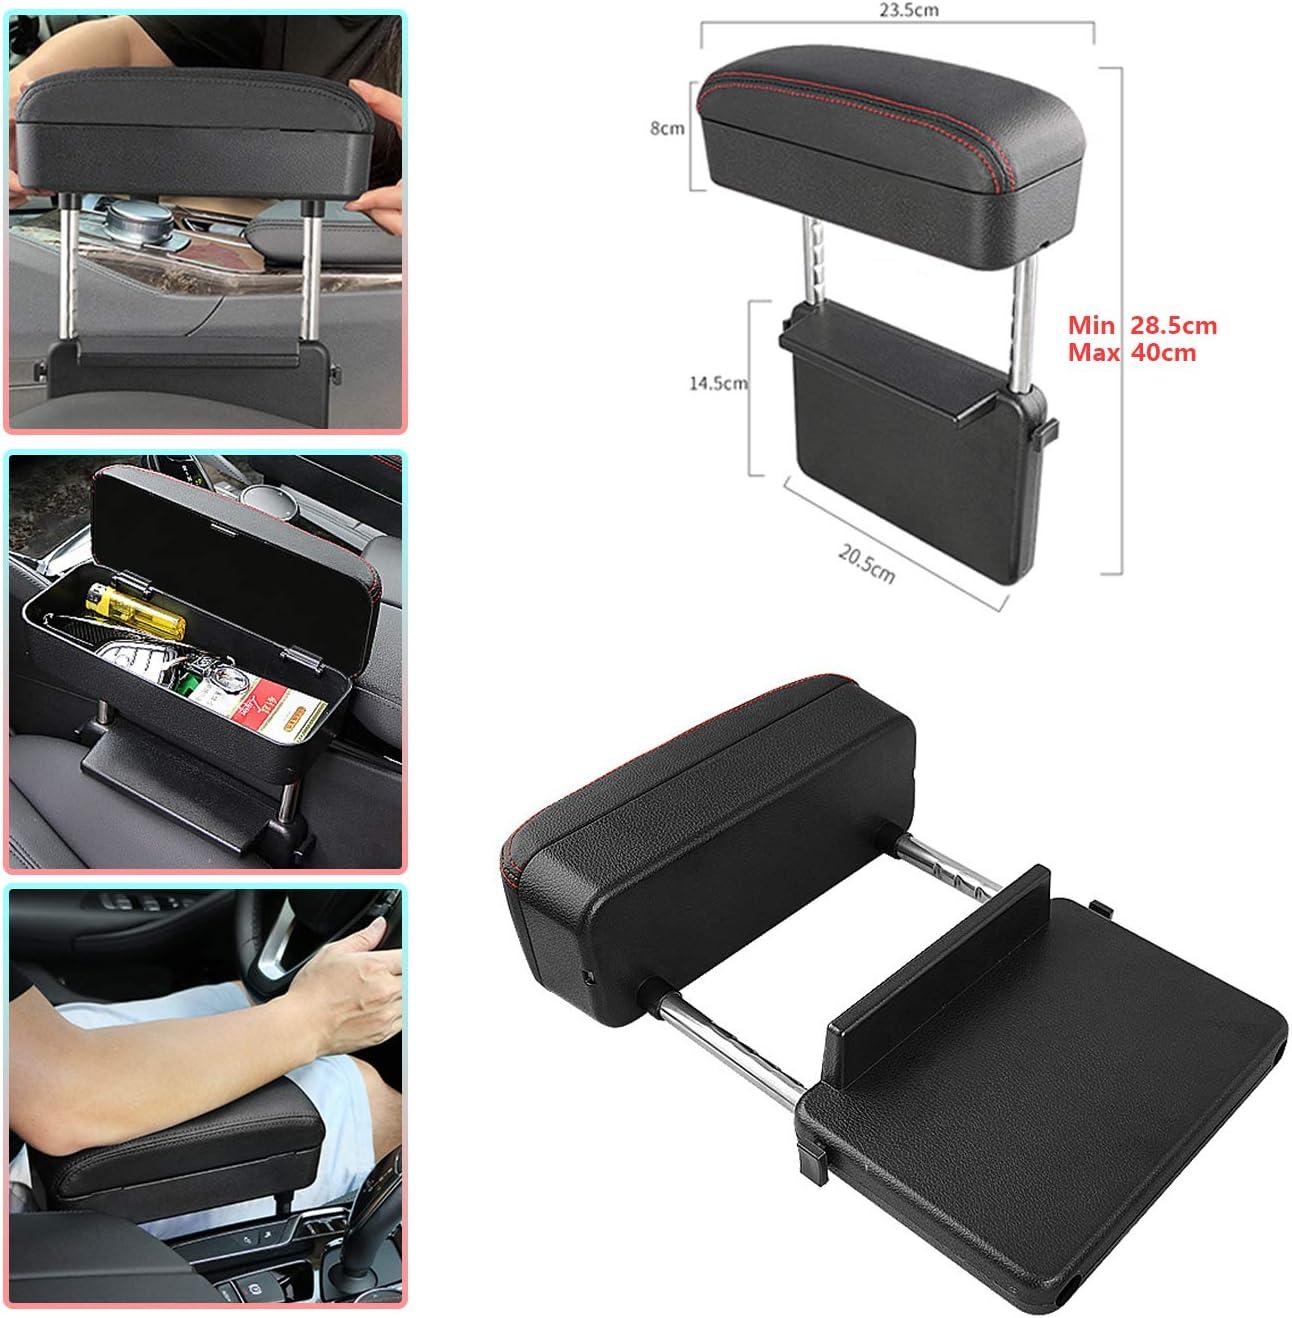 CDEFG Car Armrest Support Elbow Rest Pad Armrest Extender Red Line Adjustable Height Comfort Arm Rest Pads Console Storage Organizer Universal Fit for All Car Models